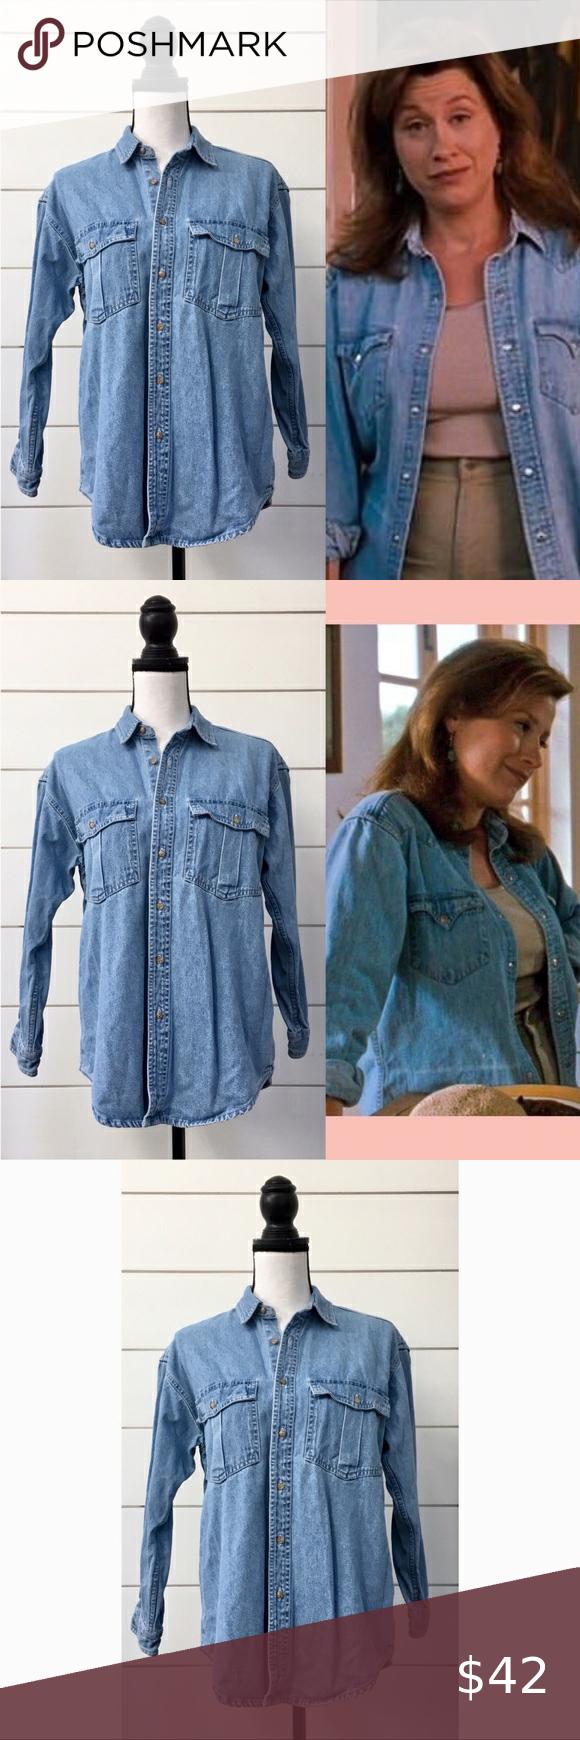 vintage denim dark wash jean 90s ruffle long sleeve blouse button down- womens large